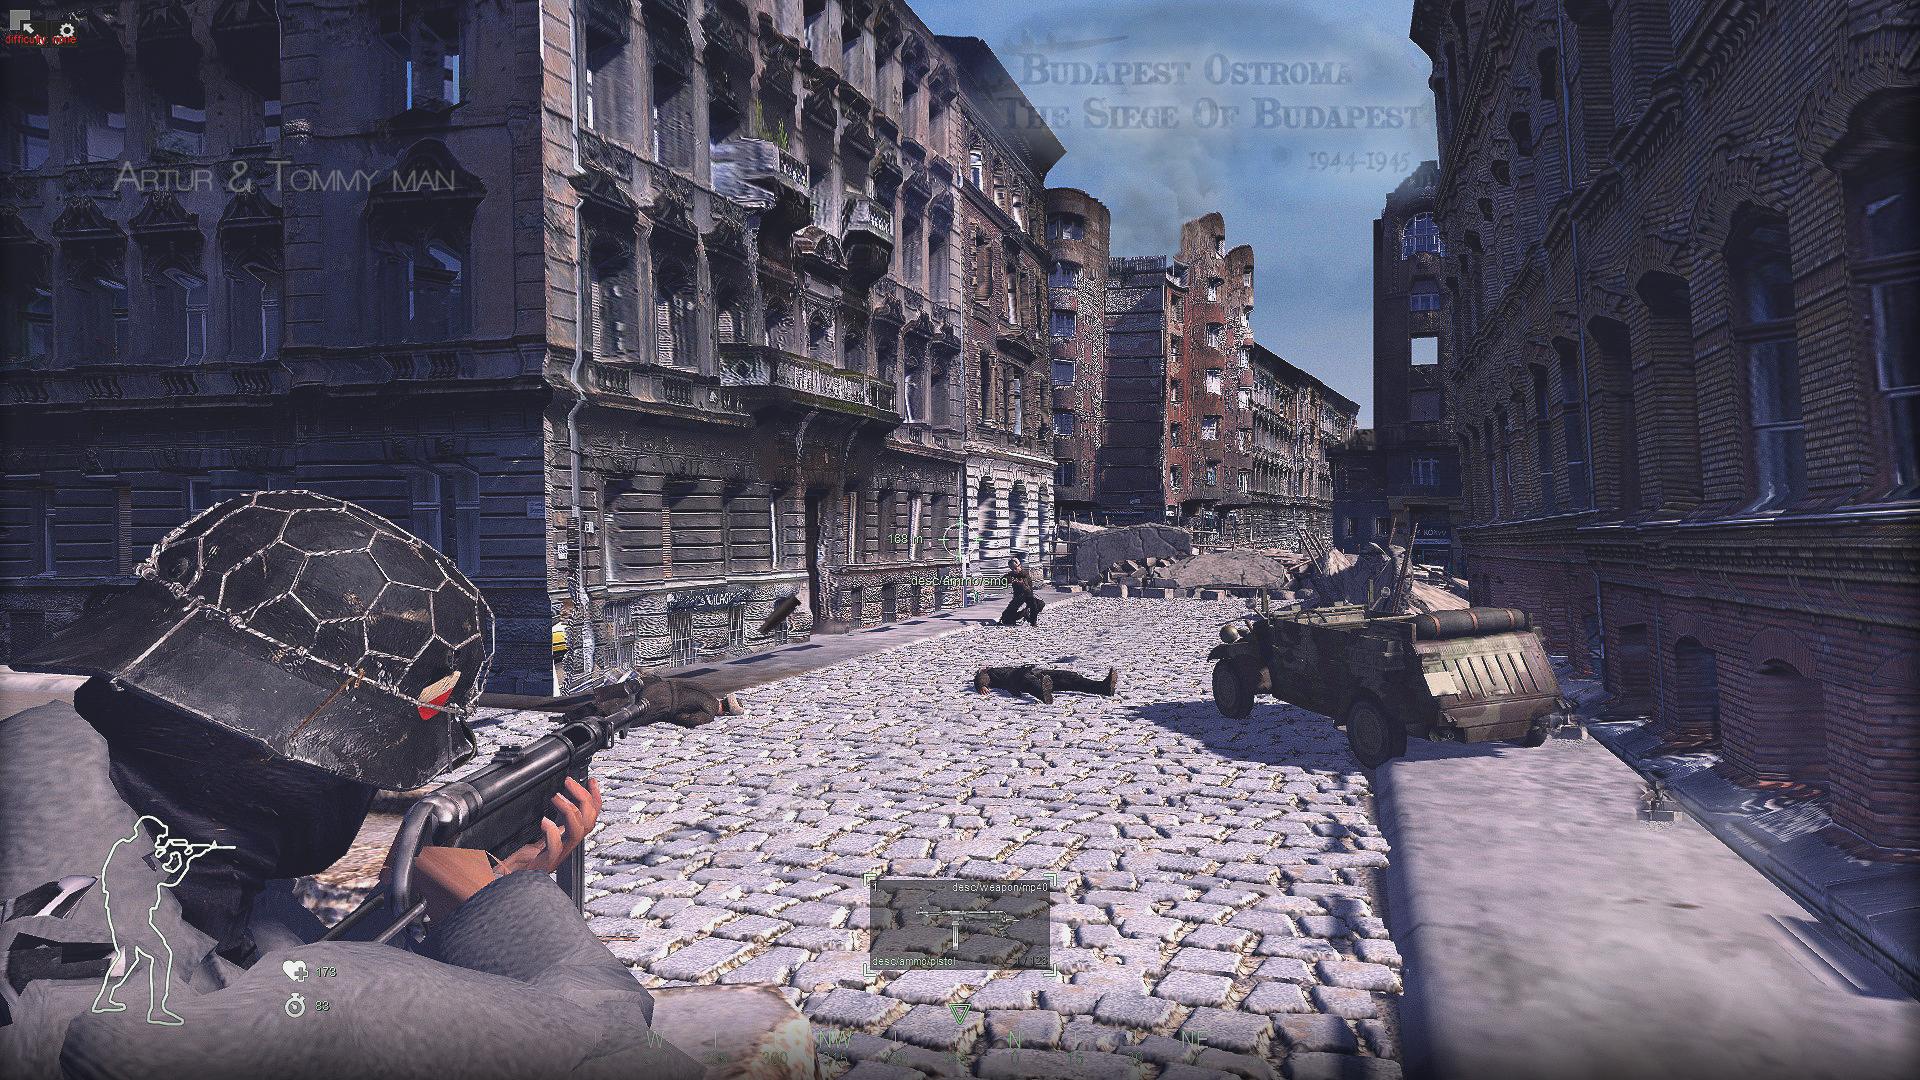 Budapest 1944-45 Ostroma siege,Mod